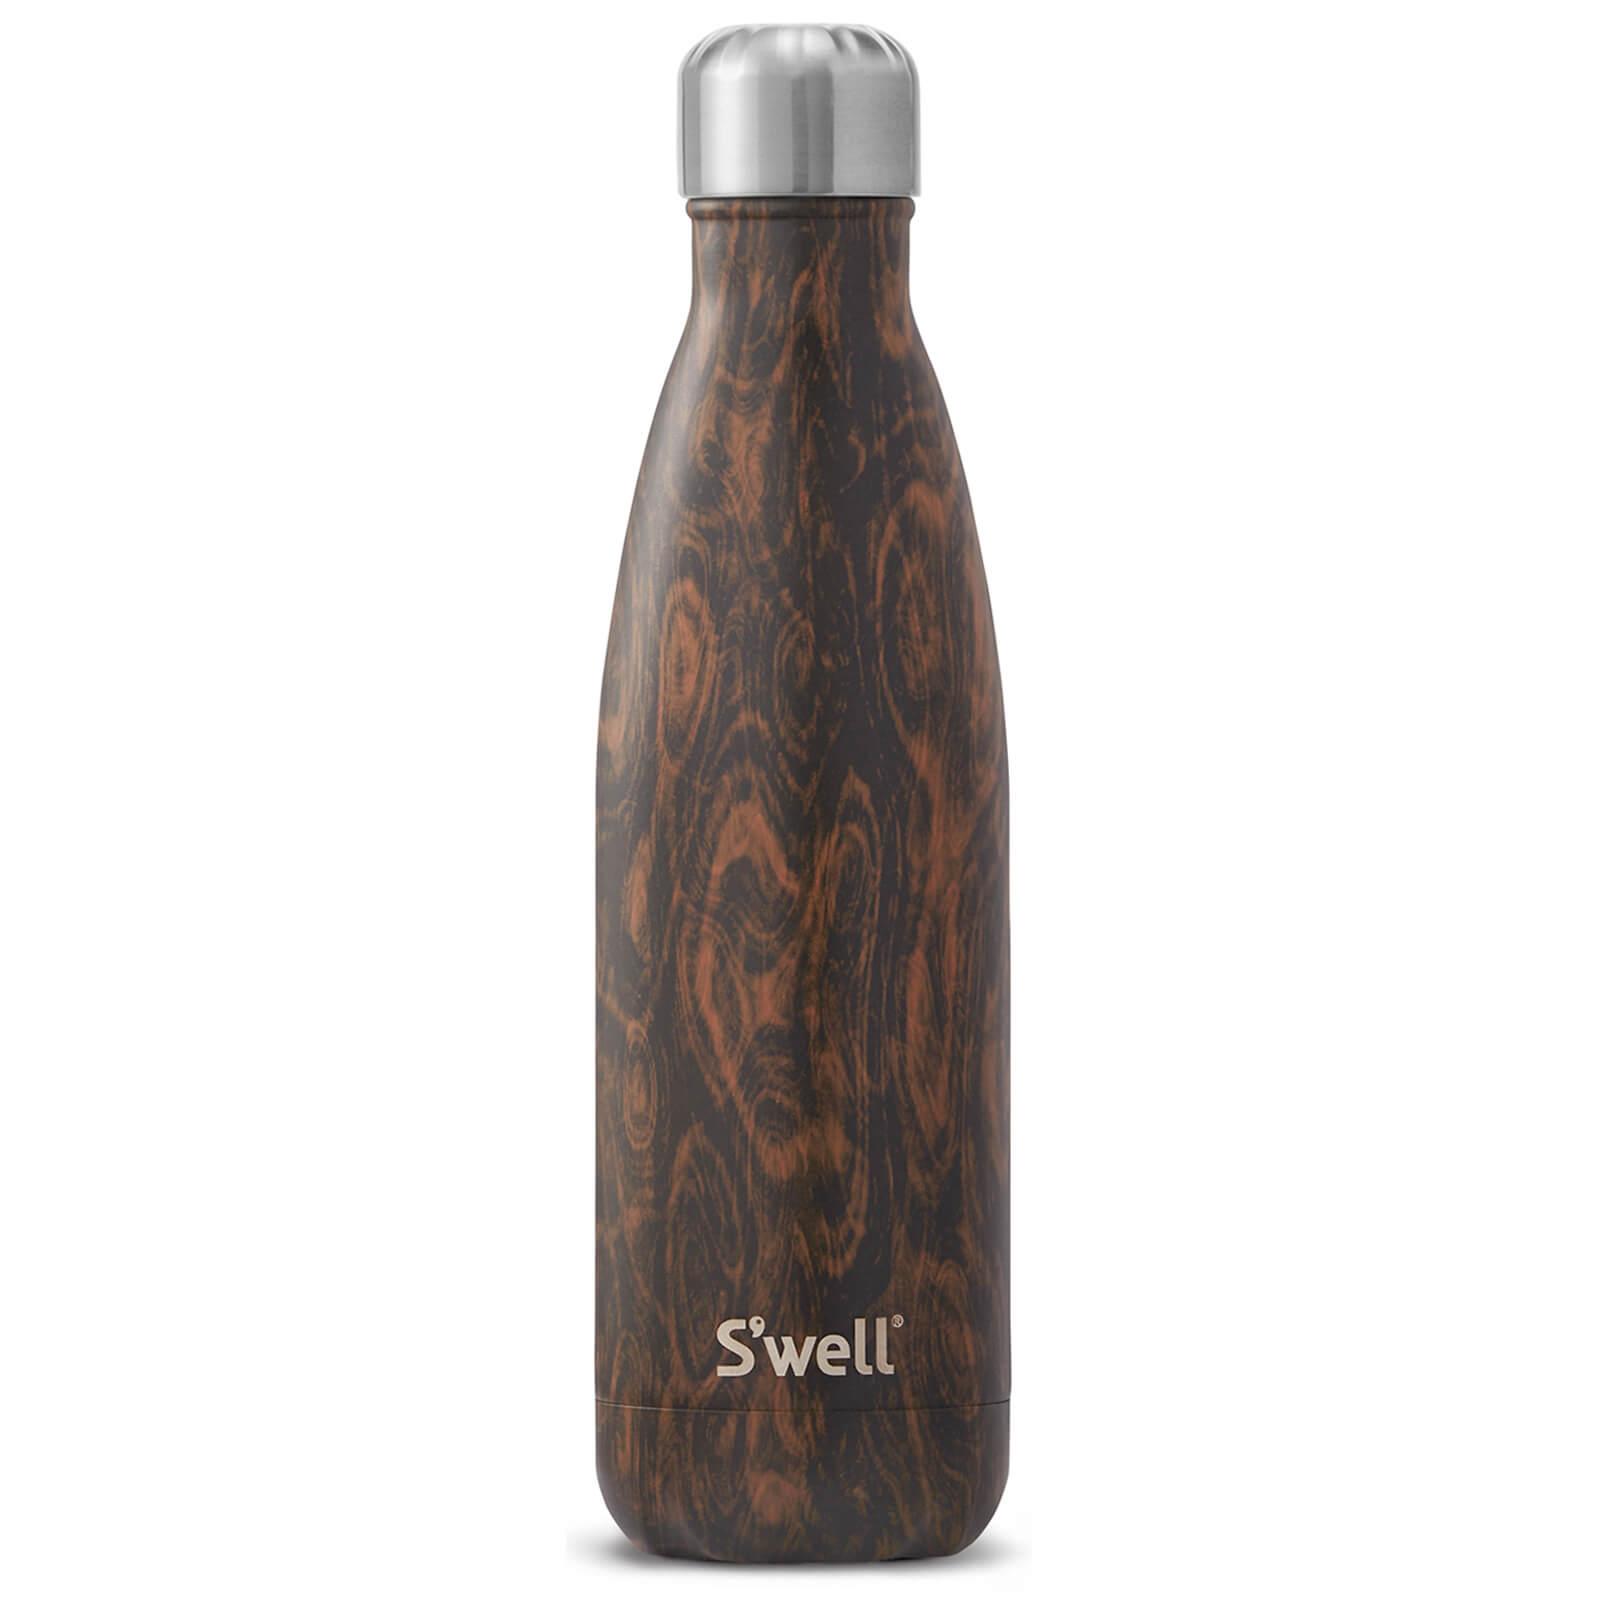 S'well The Wenge Wood Water Bottle 500ml